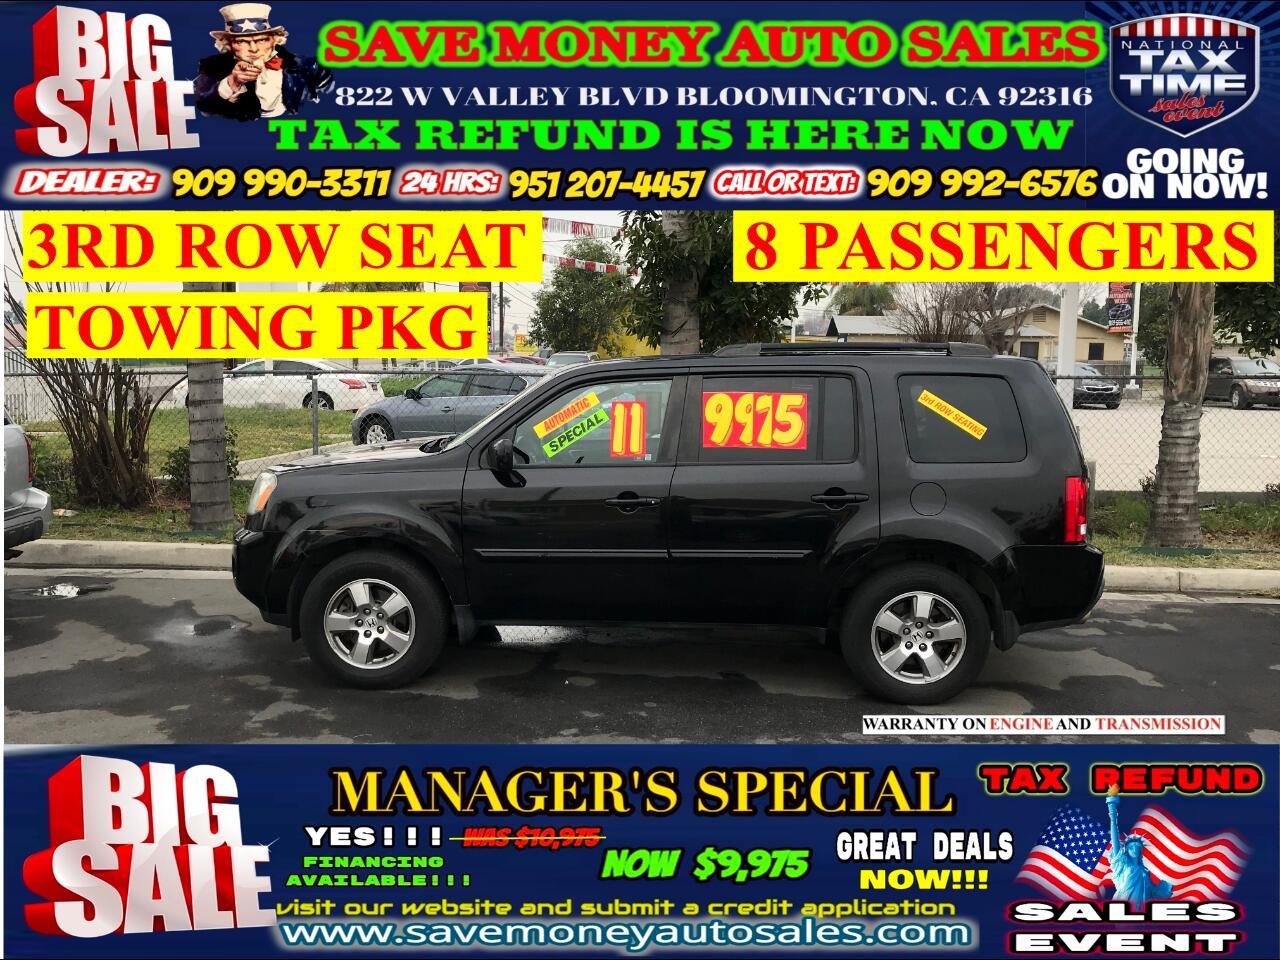 2011 Honda Pilot EX-L 4WD> 3RD ROW SEAT> 8 PASSENGERS>TOWING PKG